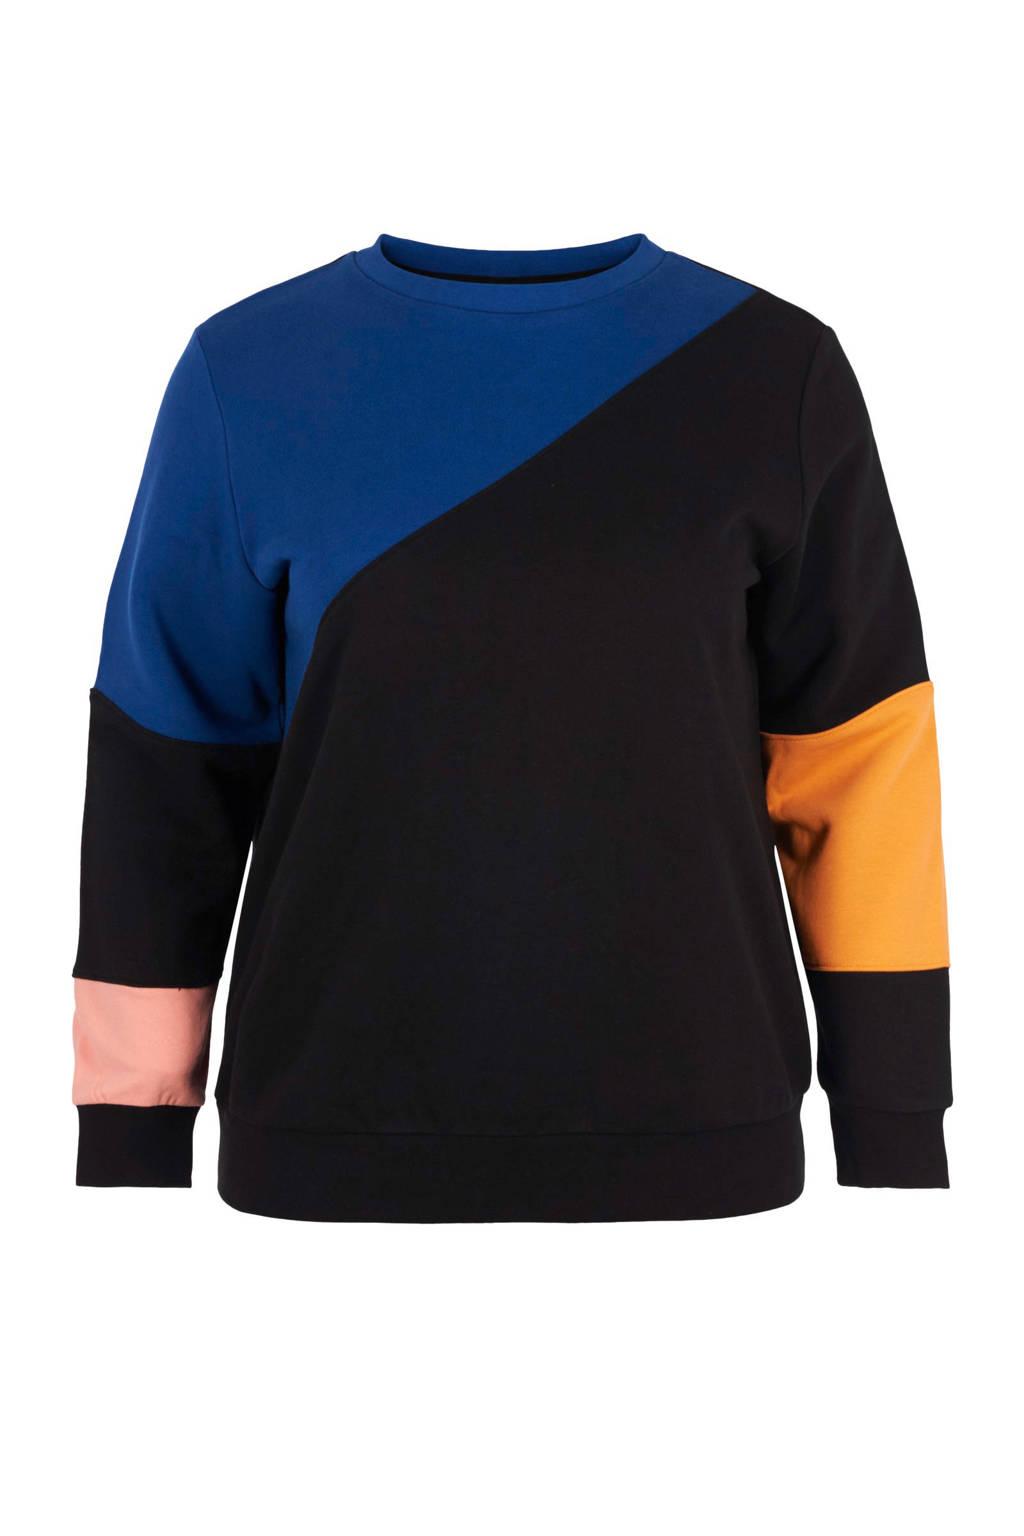 ACTIVE By Zizzi sportsweater zwart, Zwart/blauw/geel/roze